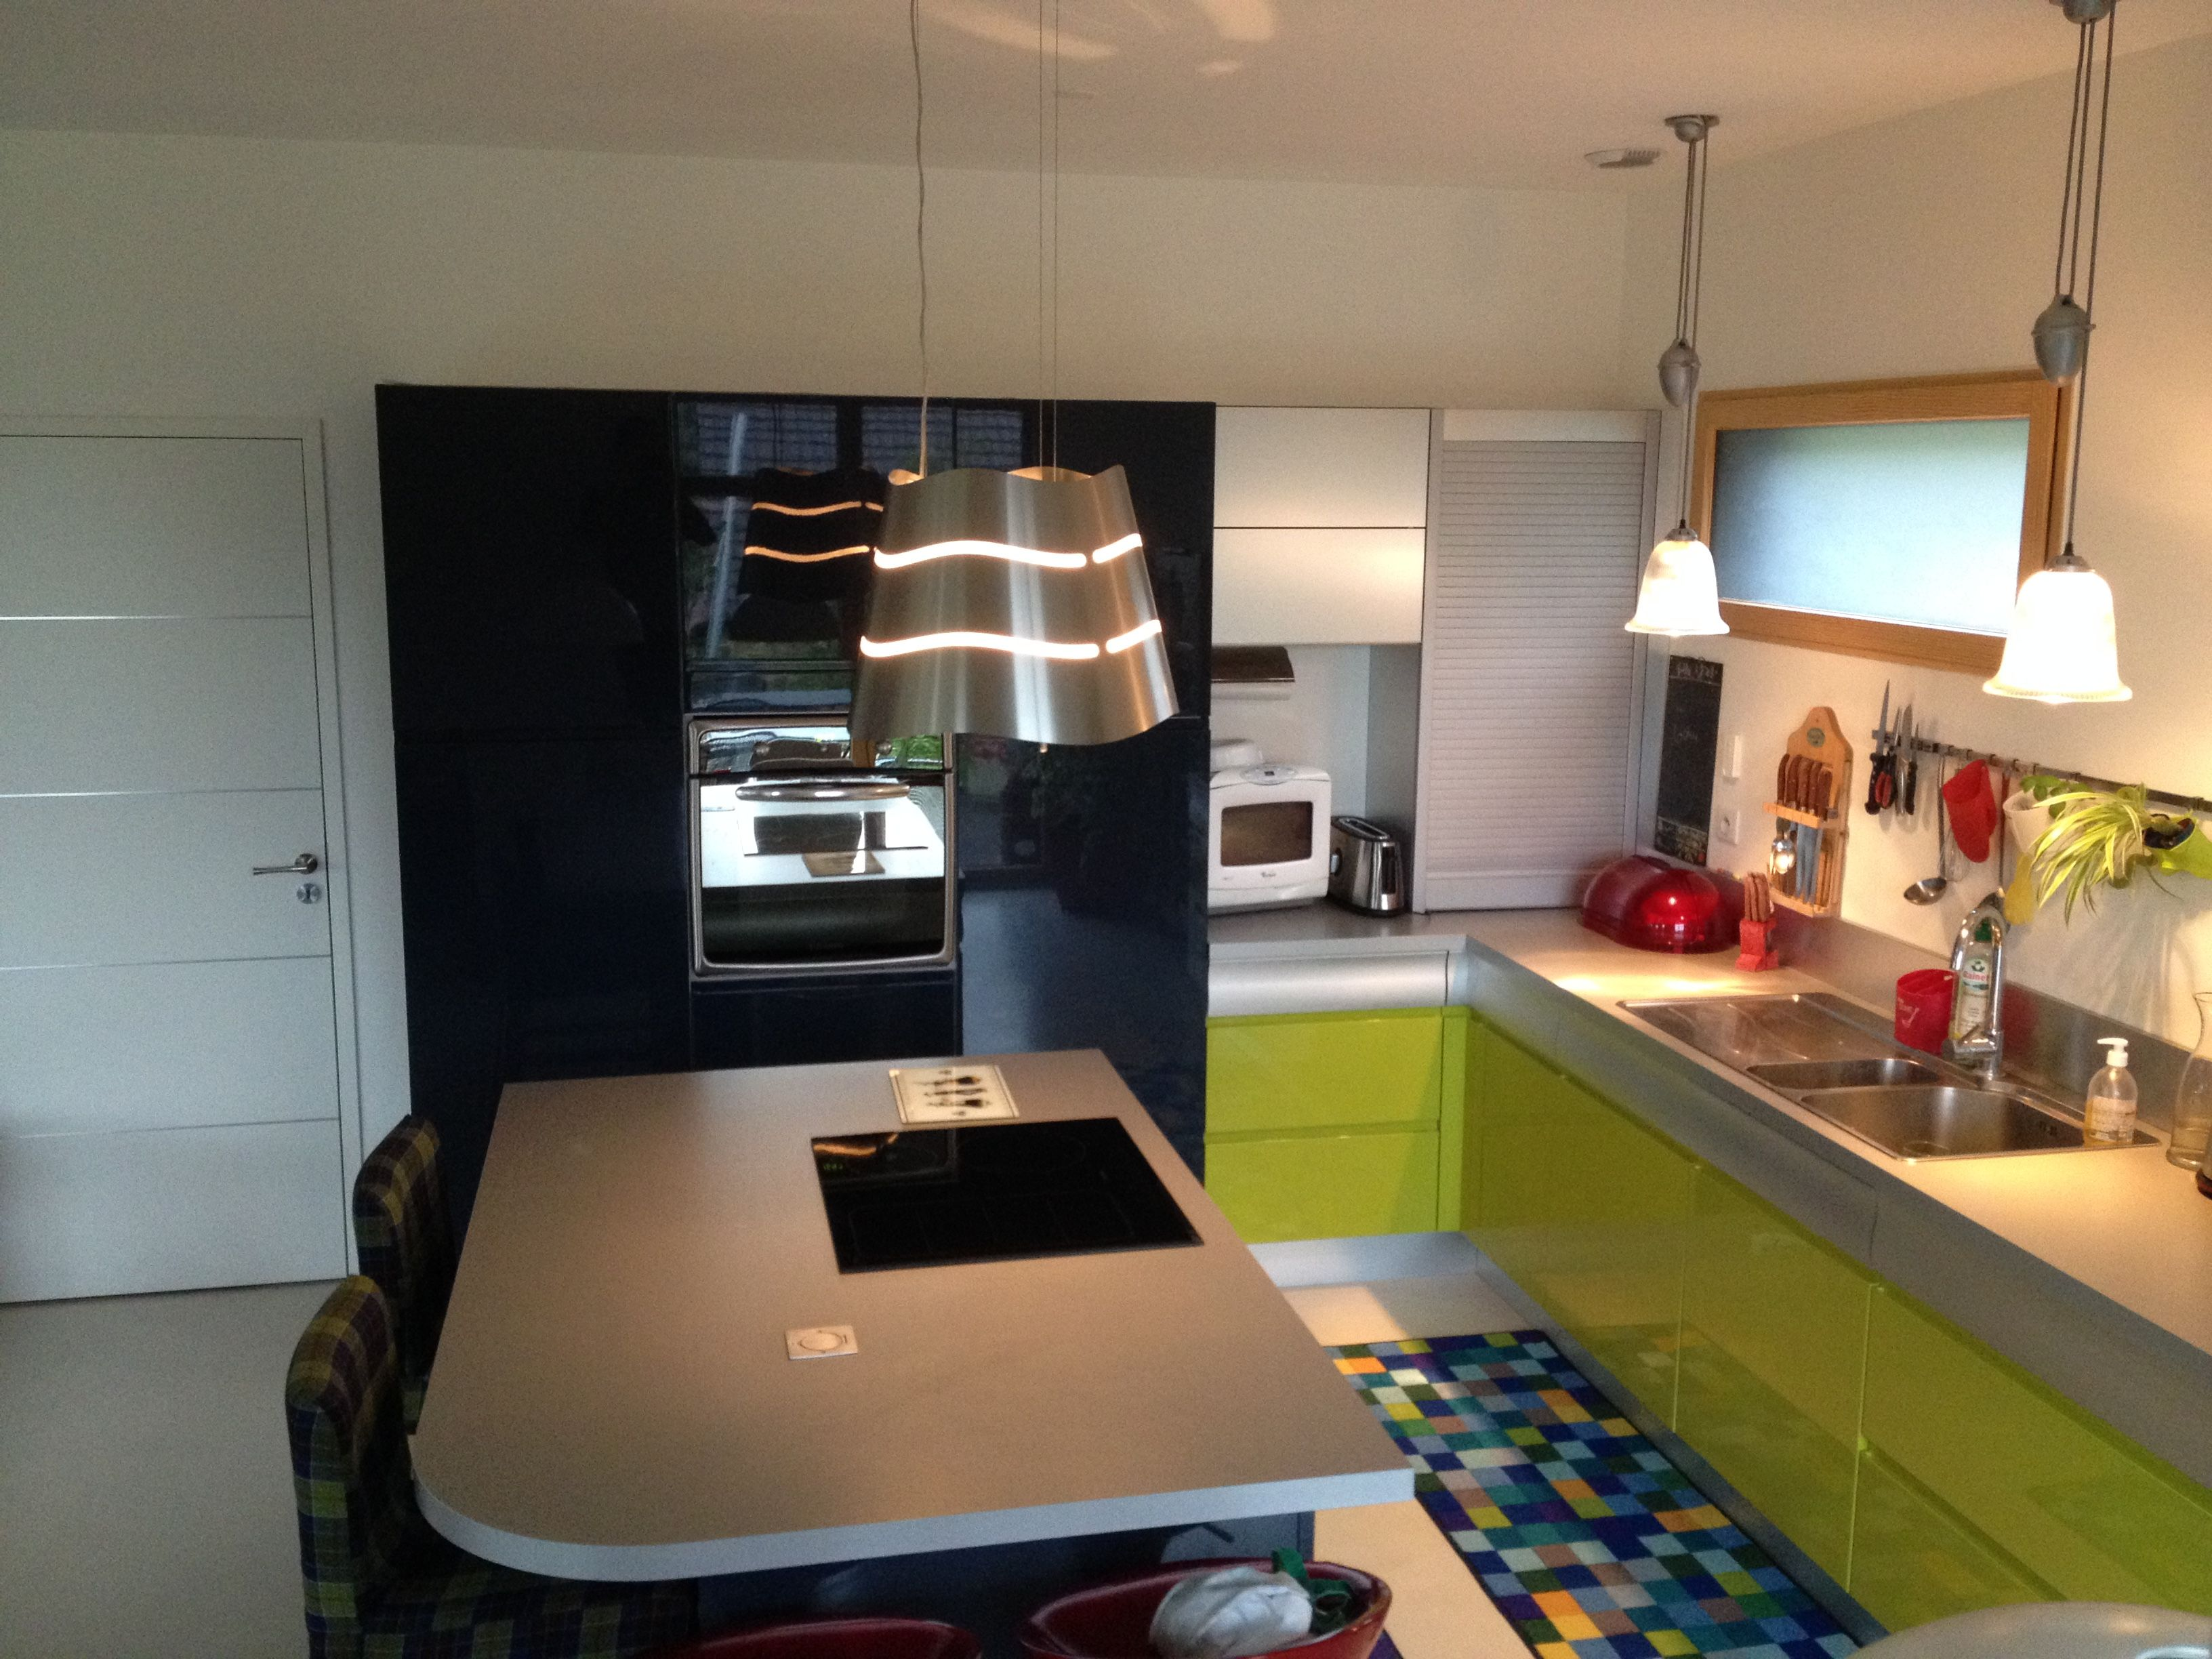 orgeval cuisine verte magasin de cuisine et cuisine. Black Bedroom Furniture Sets. Home Design Ideas